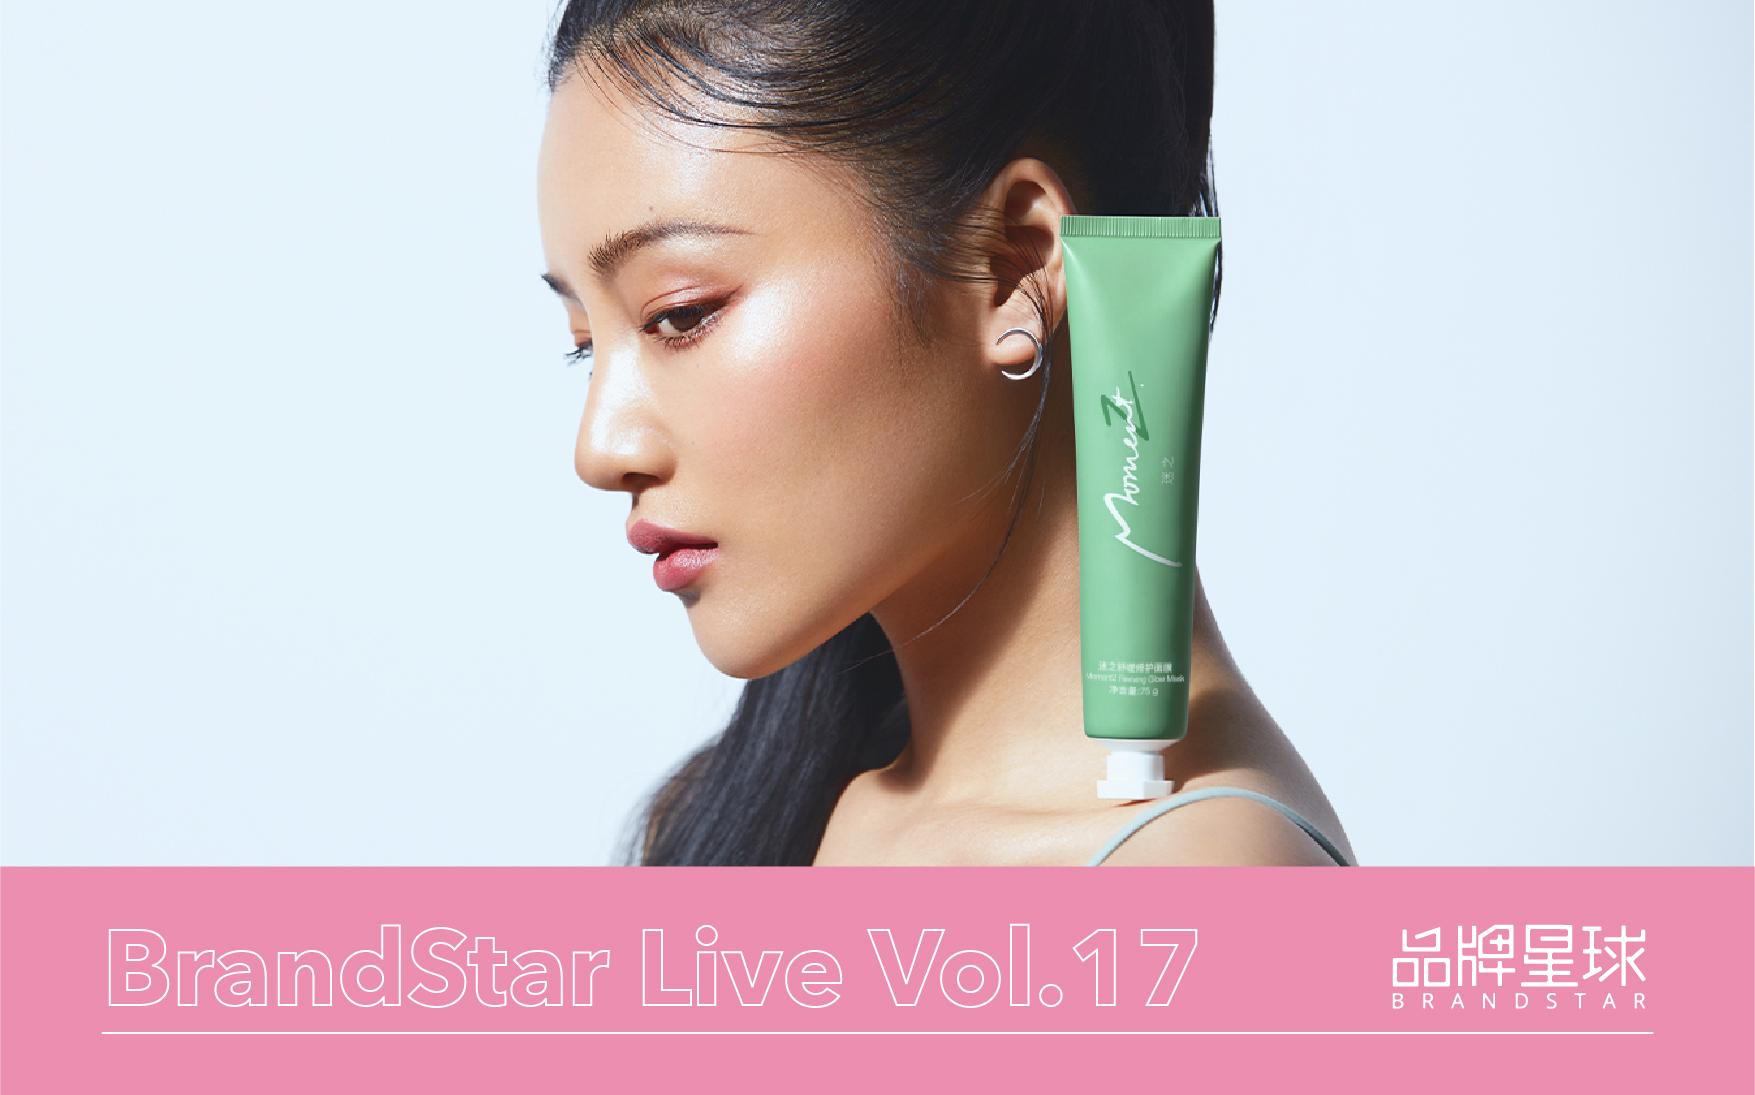 MomentZ迷之:纯净美妆趋势下,如何精细化打造和推广一款明星单品?  | BrandStar访谈&直播分享